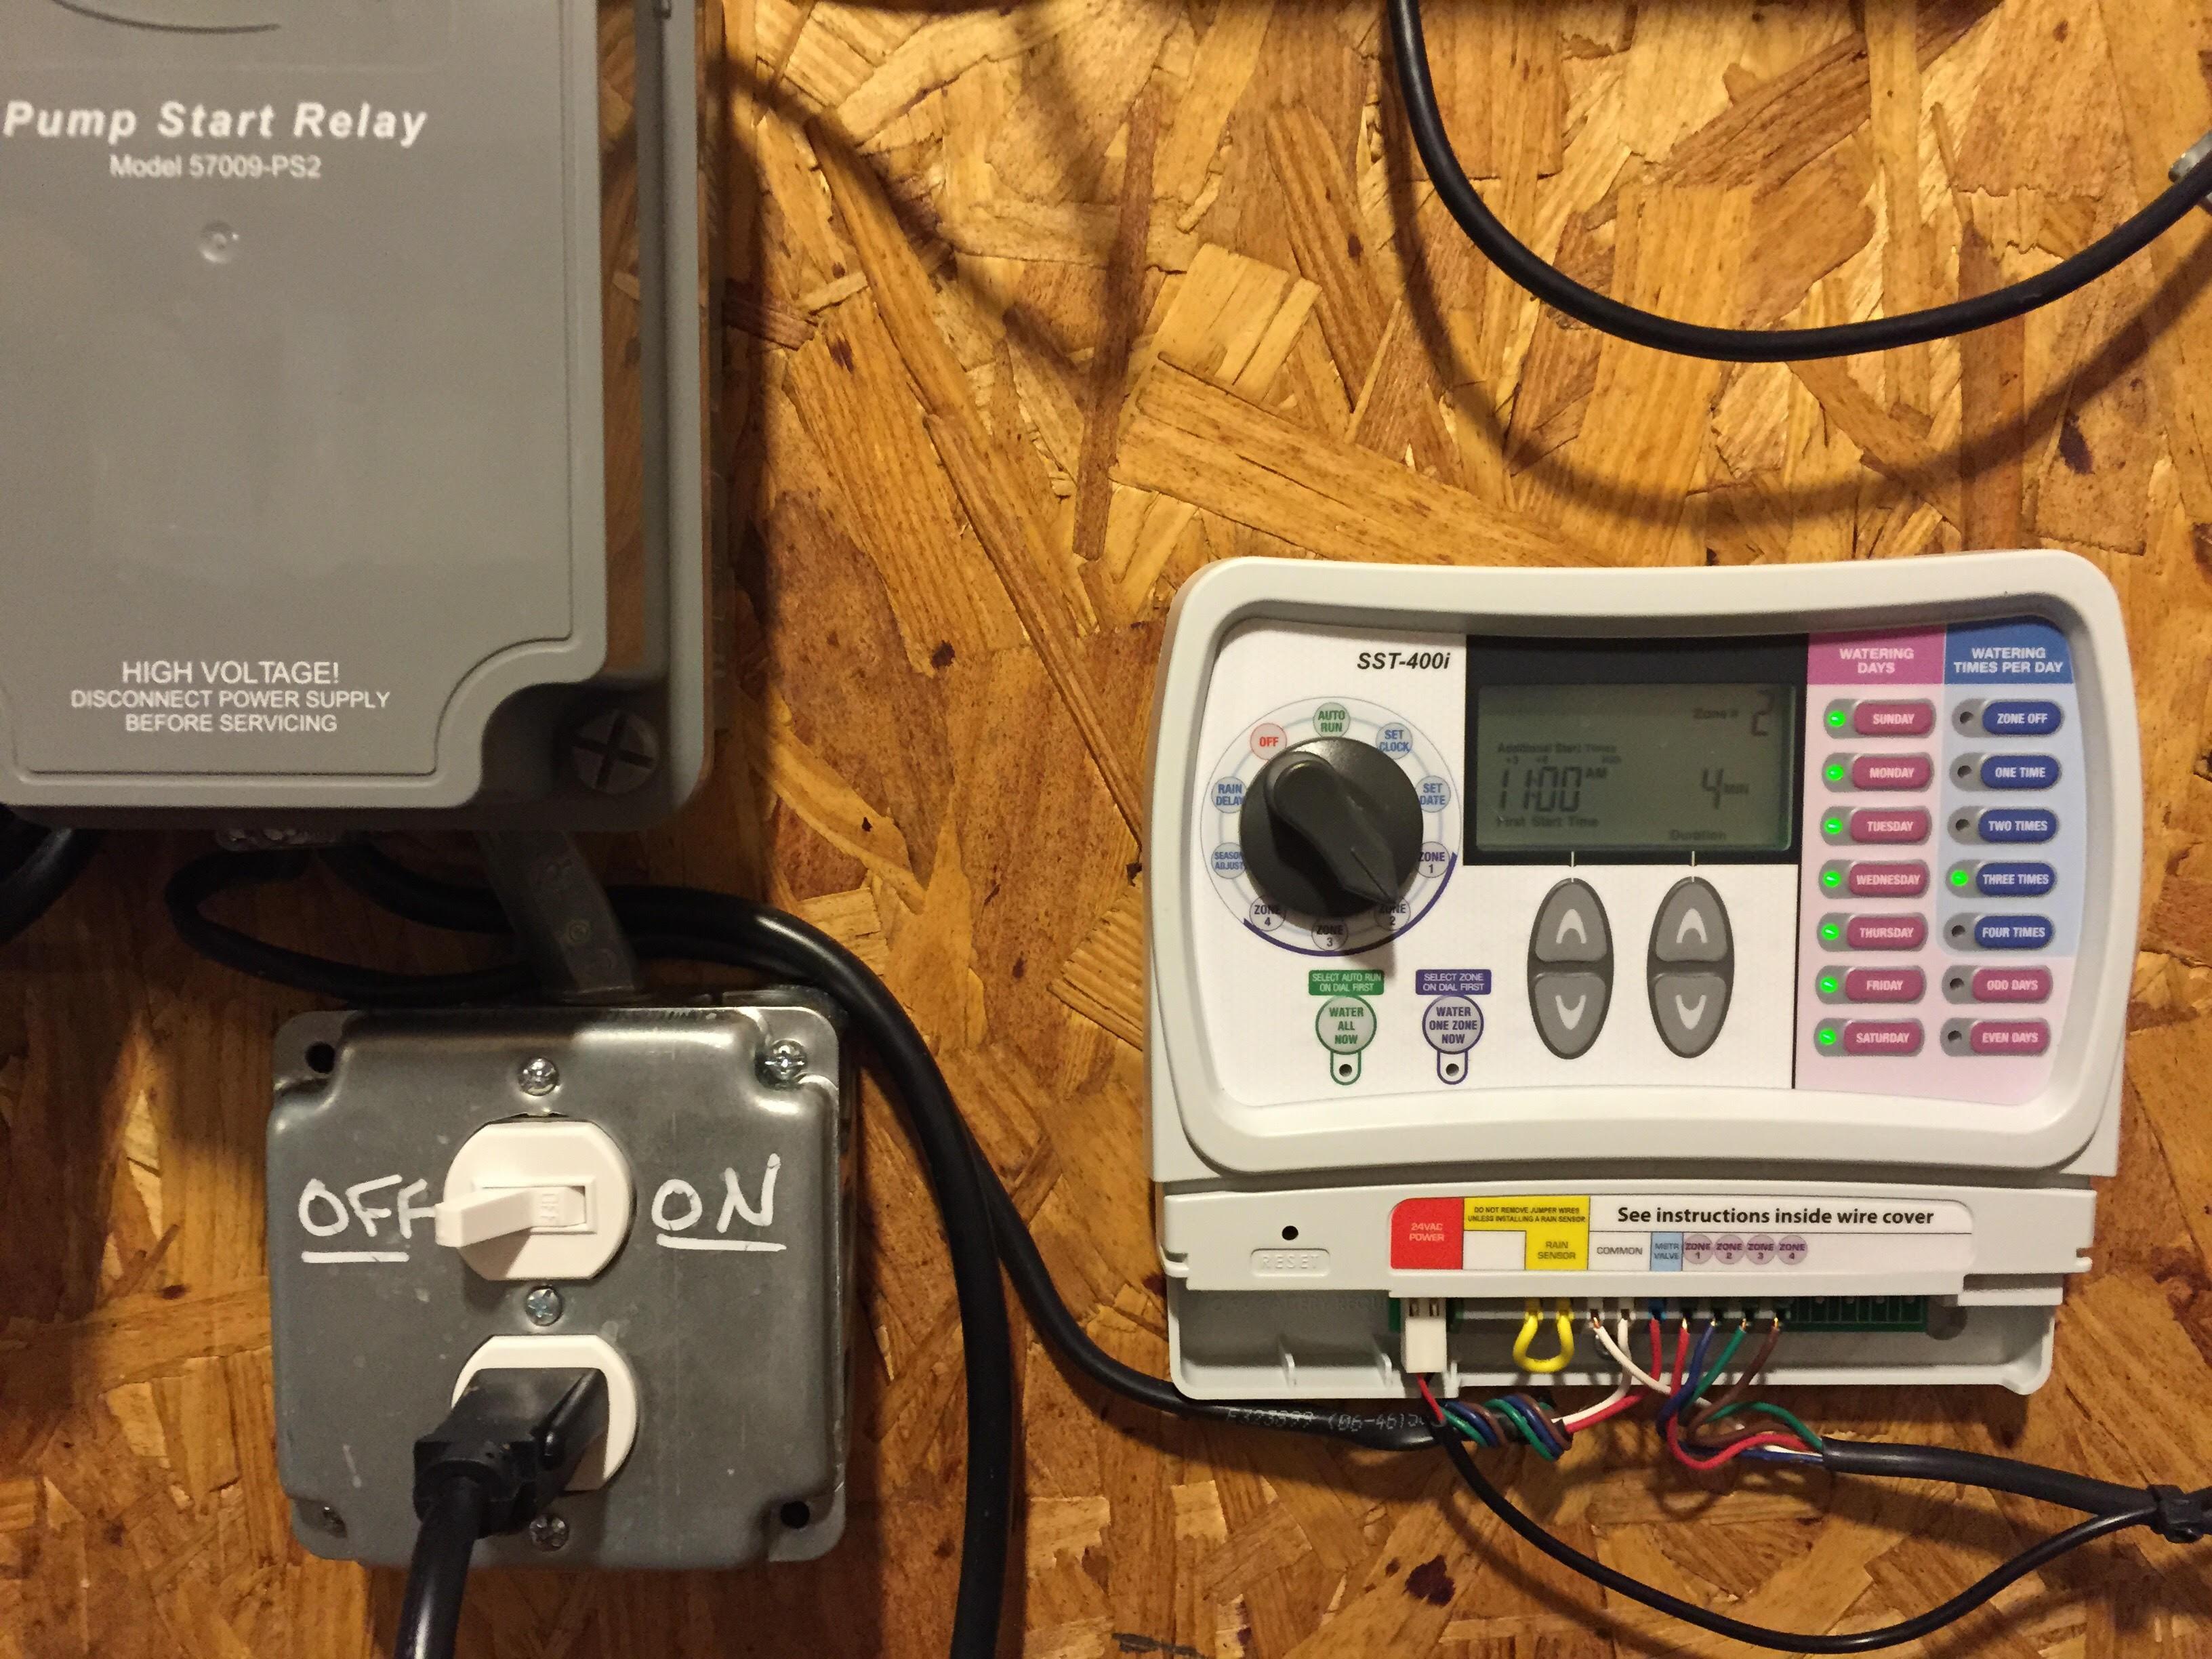 Orbit Pump Start Relay Wiring Diagram topic Opensprinkler Pump Start Relay Wiring Question Of Orbit Pump Start Relay Wiring Diagram